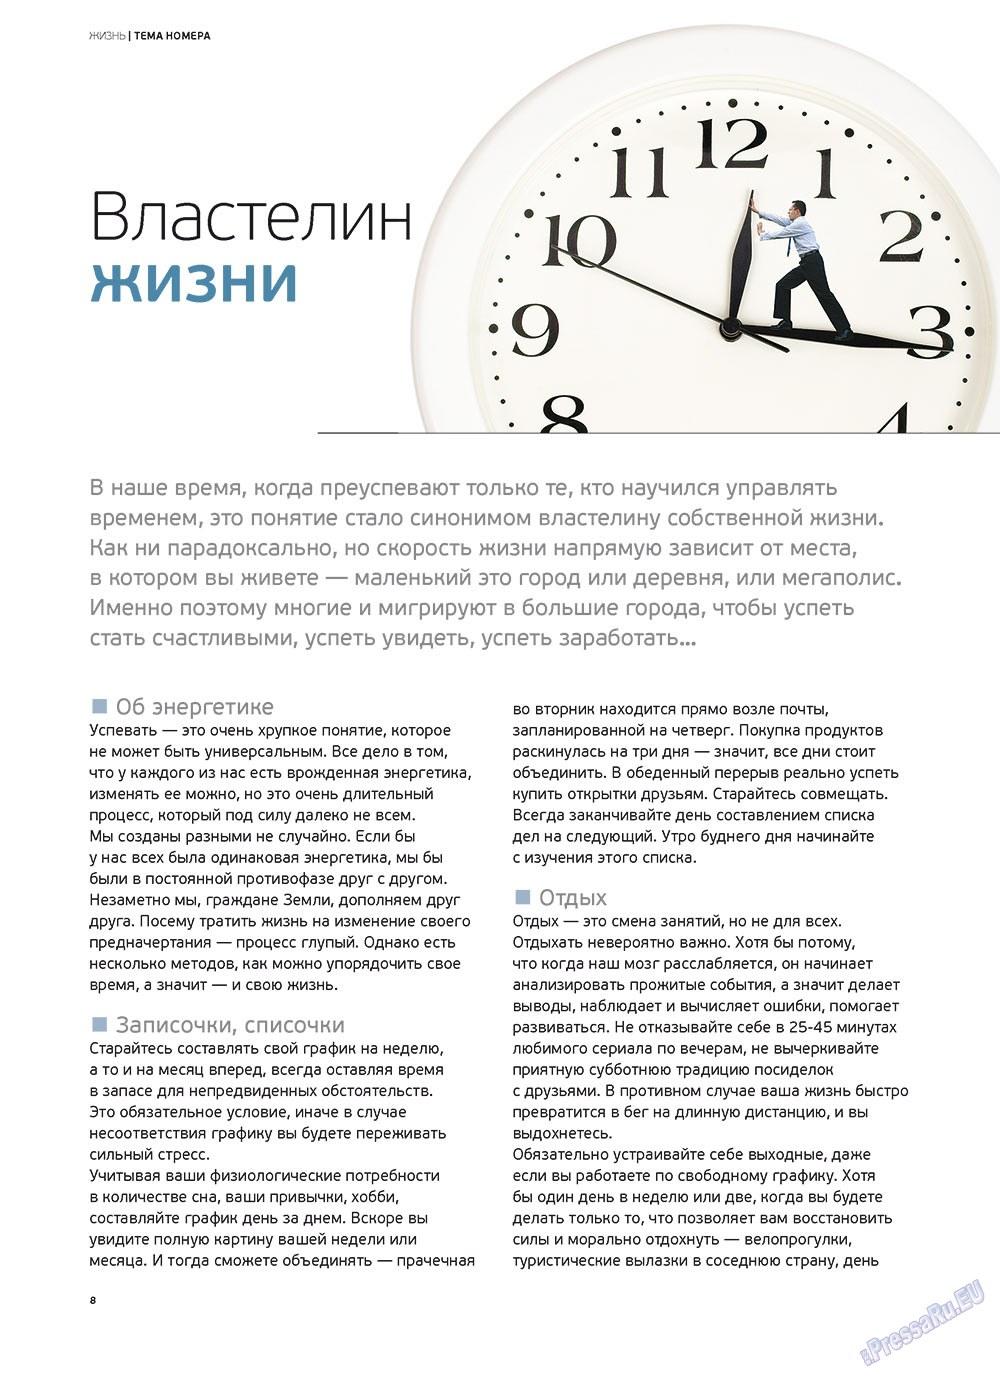 Артек (журнал). 2011 год, номер 6, стр. 10